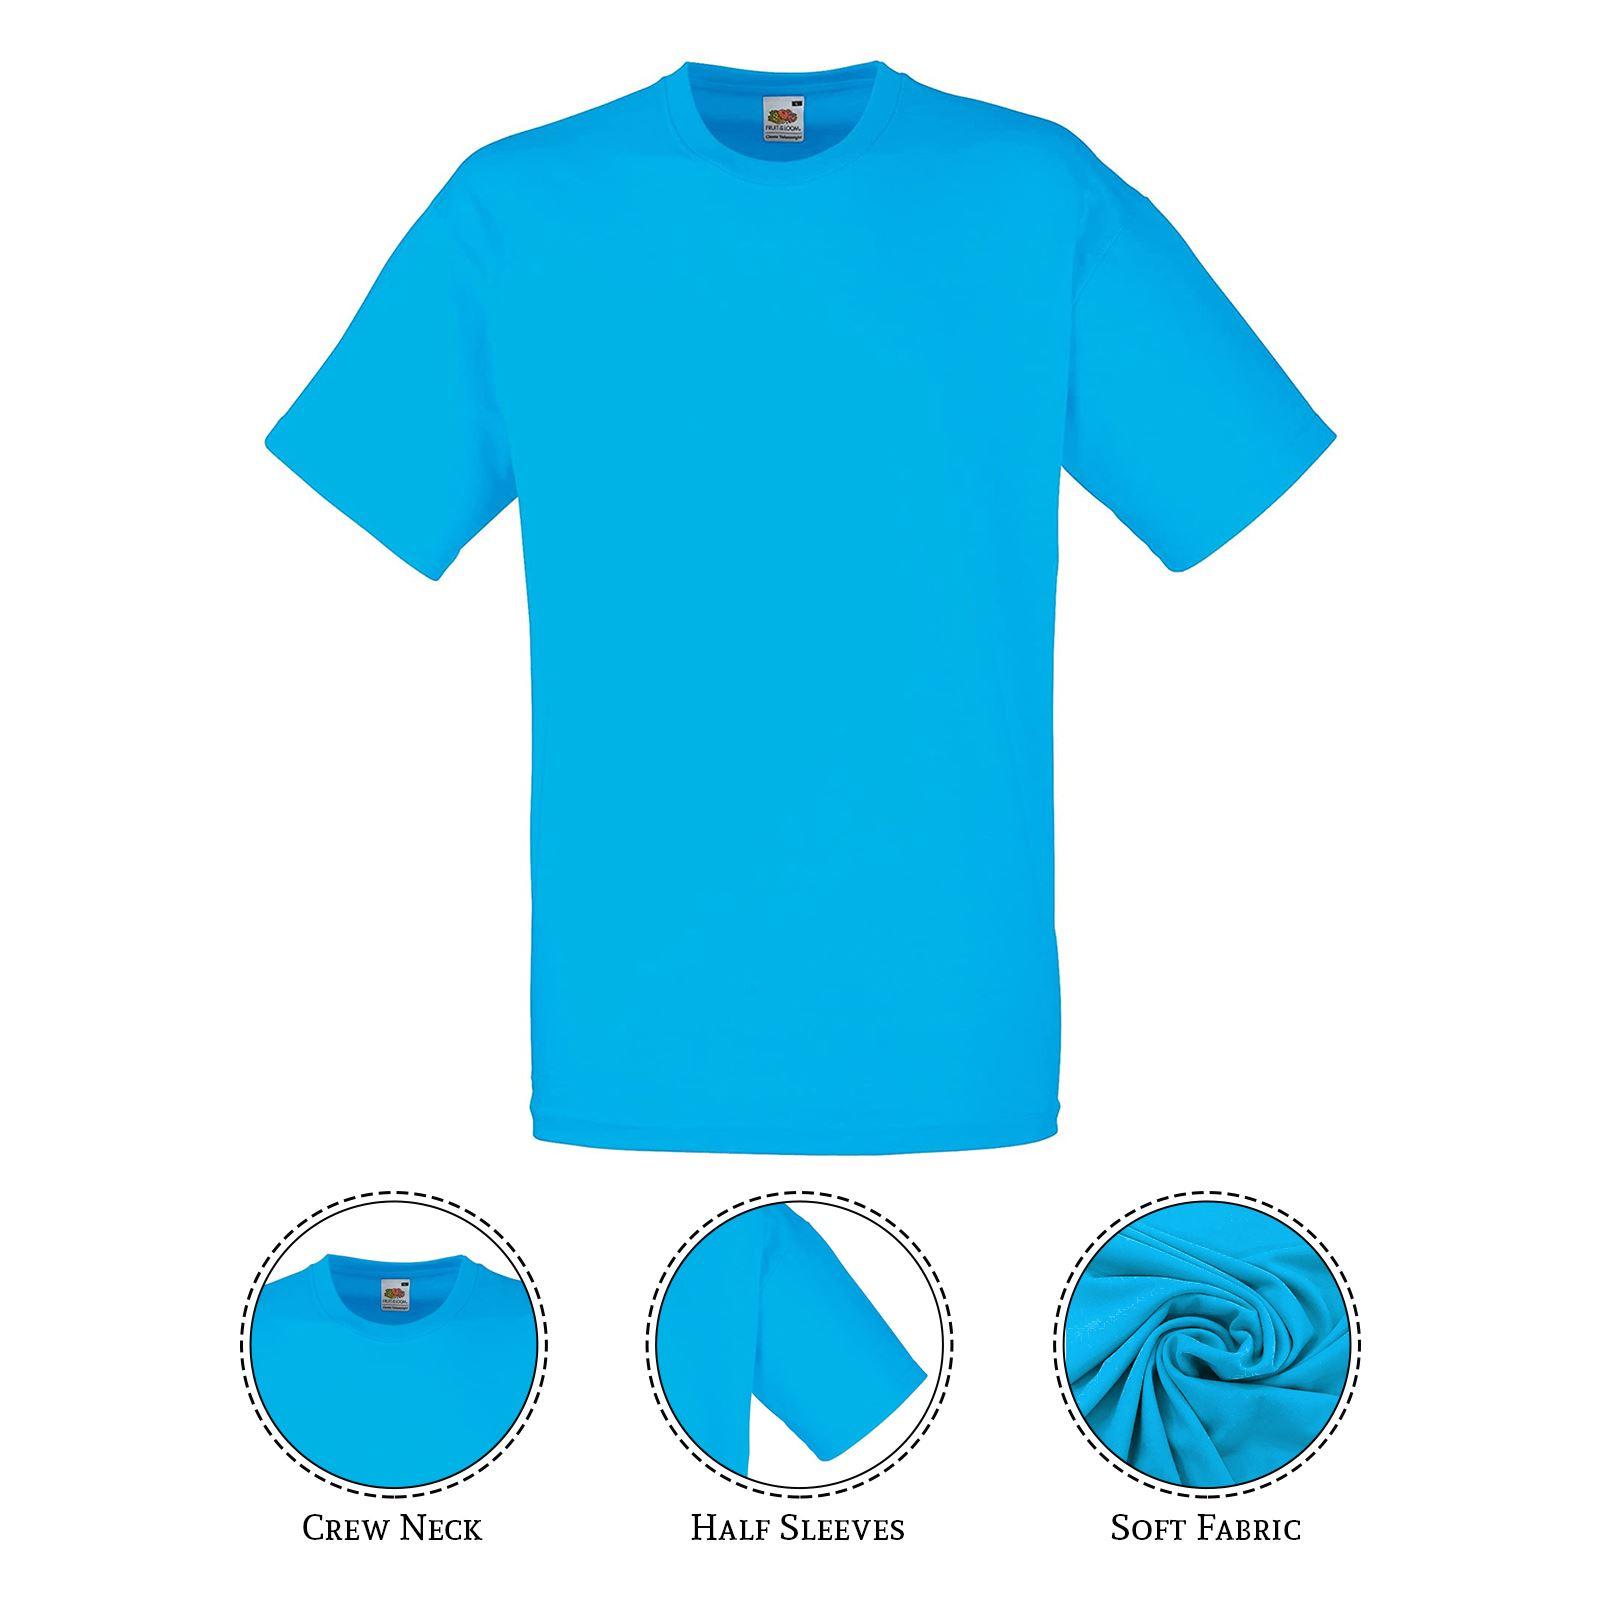 thumbnail 5 - Men-s-Fruit-Of-The-Loom-T-Shirt-Original-100-Cotton-Casual-Plain-Top-Tee